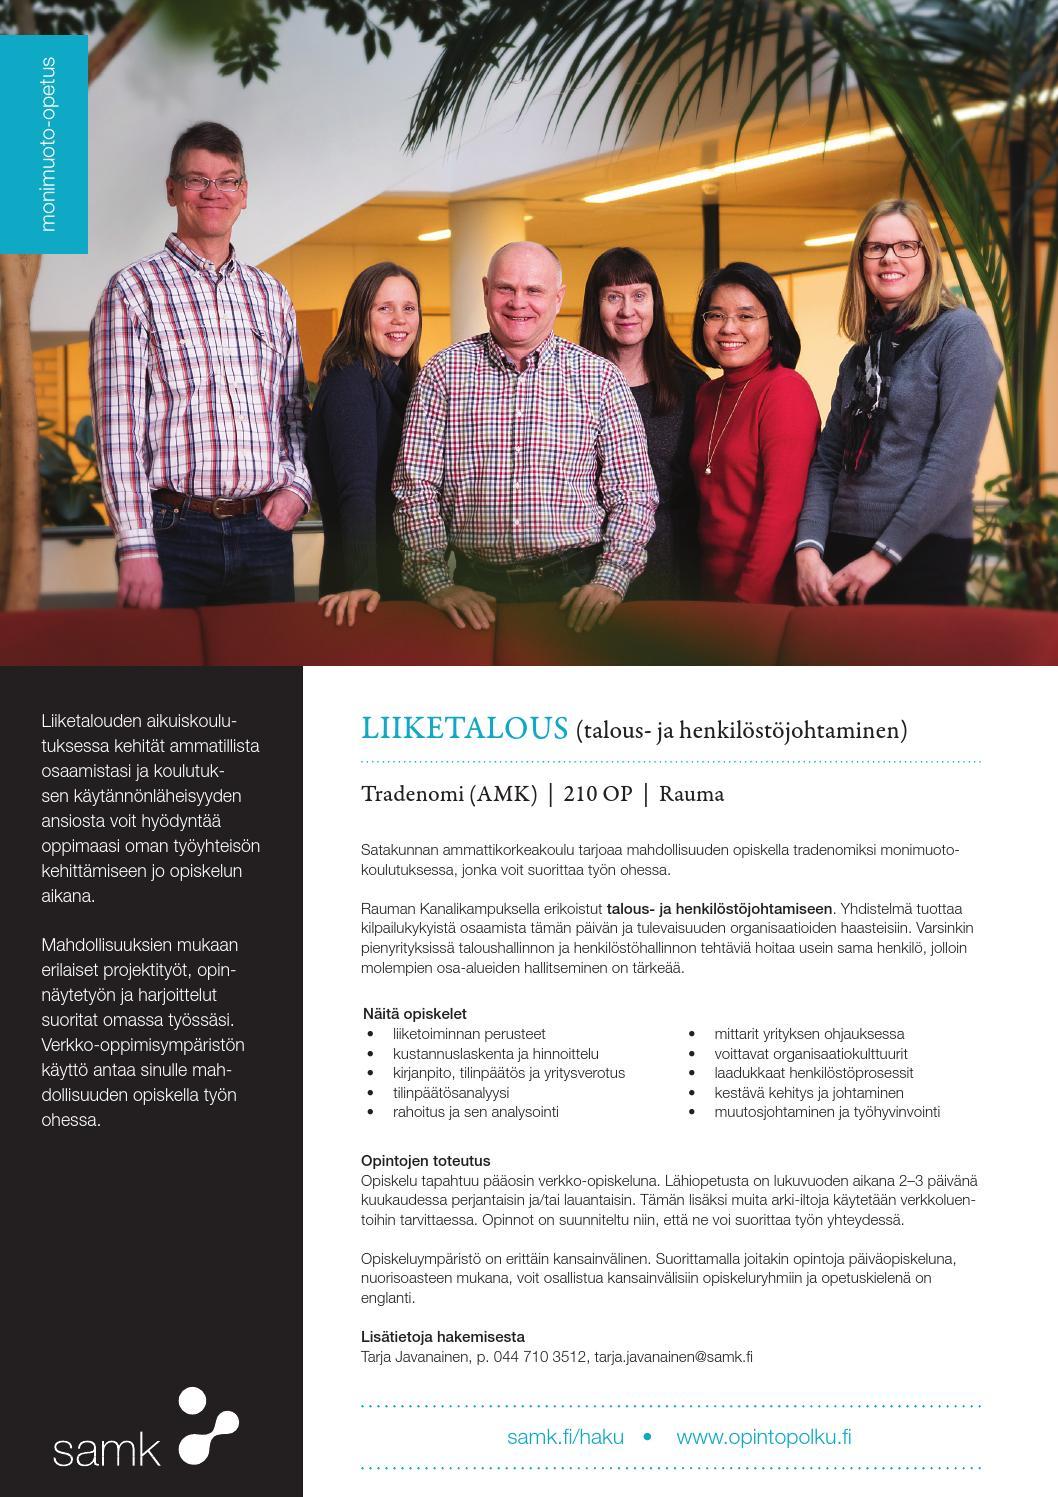 Liiketalous, Rauma, monimuoto by SAMK Satakunta University of Applied Sciences - Issuu